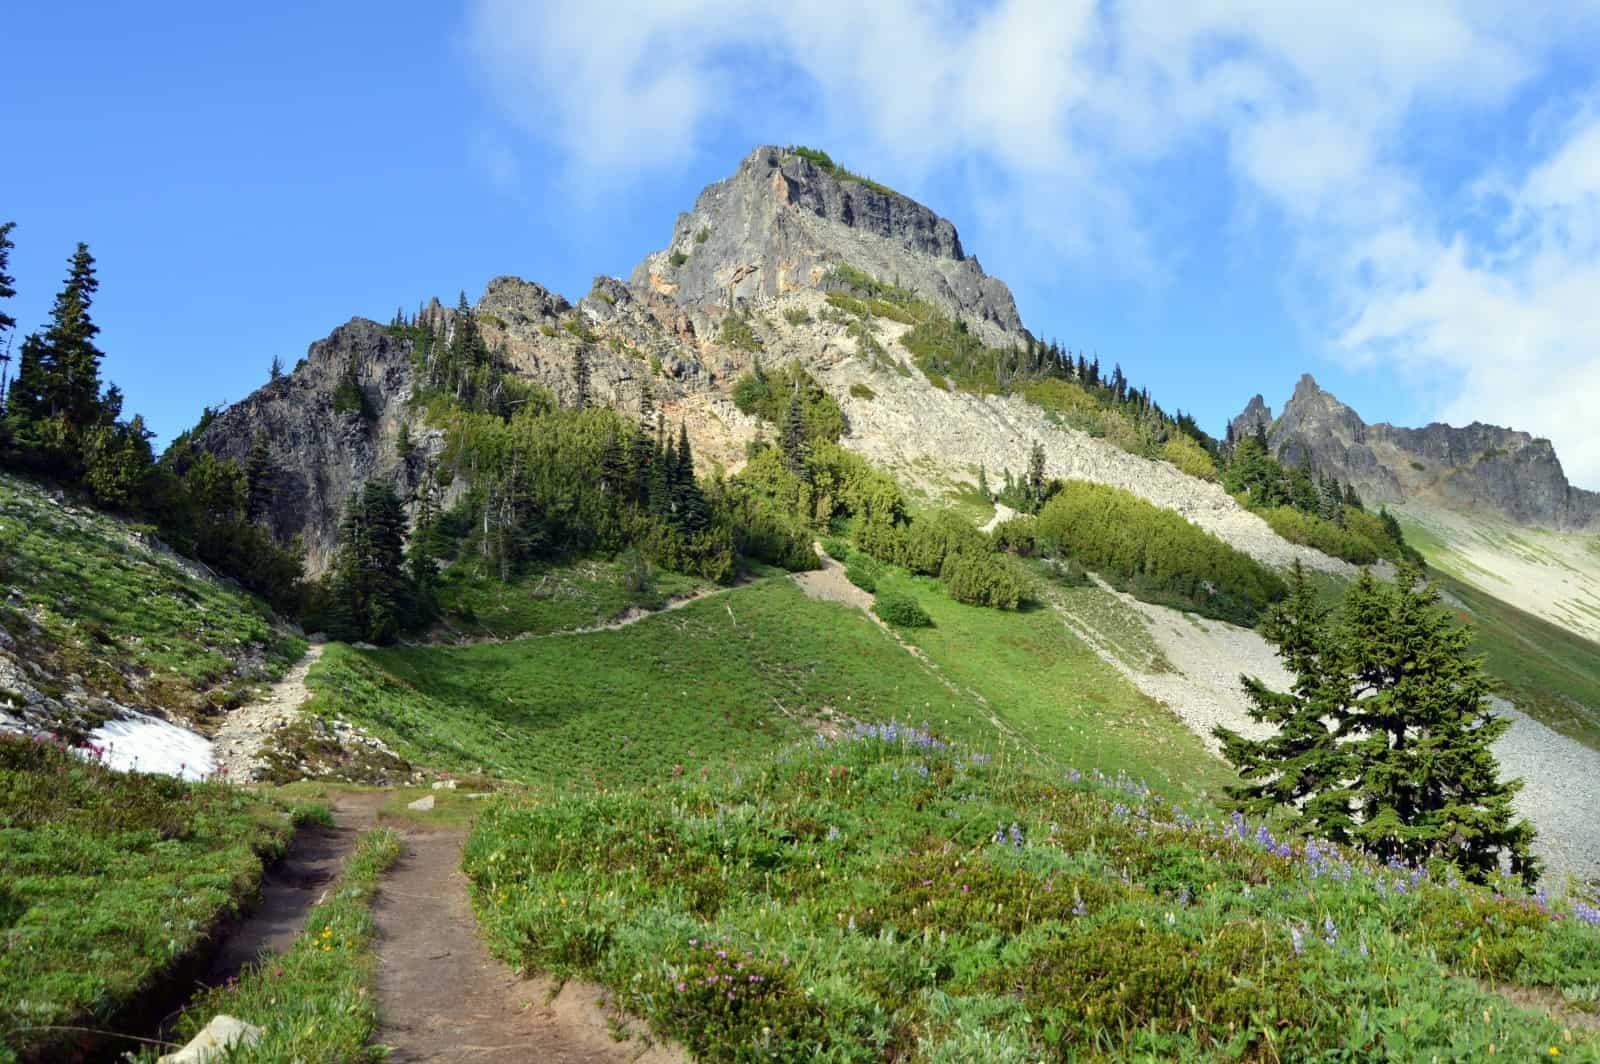 trail description, photos and video coming soon! Pinnacle Saddle Plummer Peak Visit Rainier